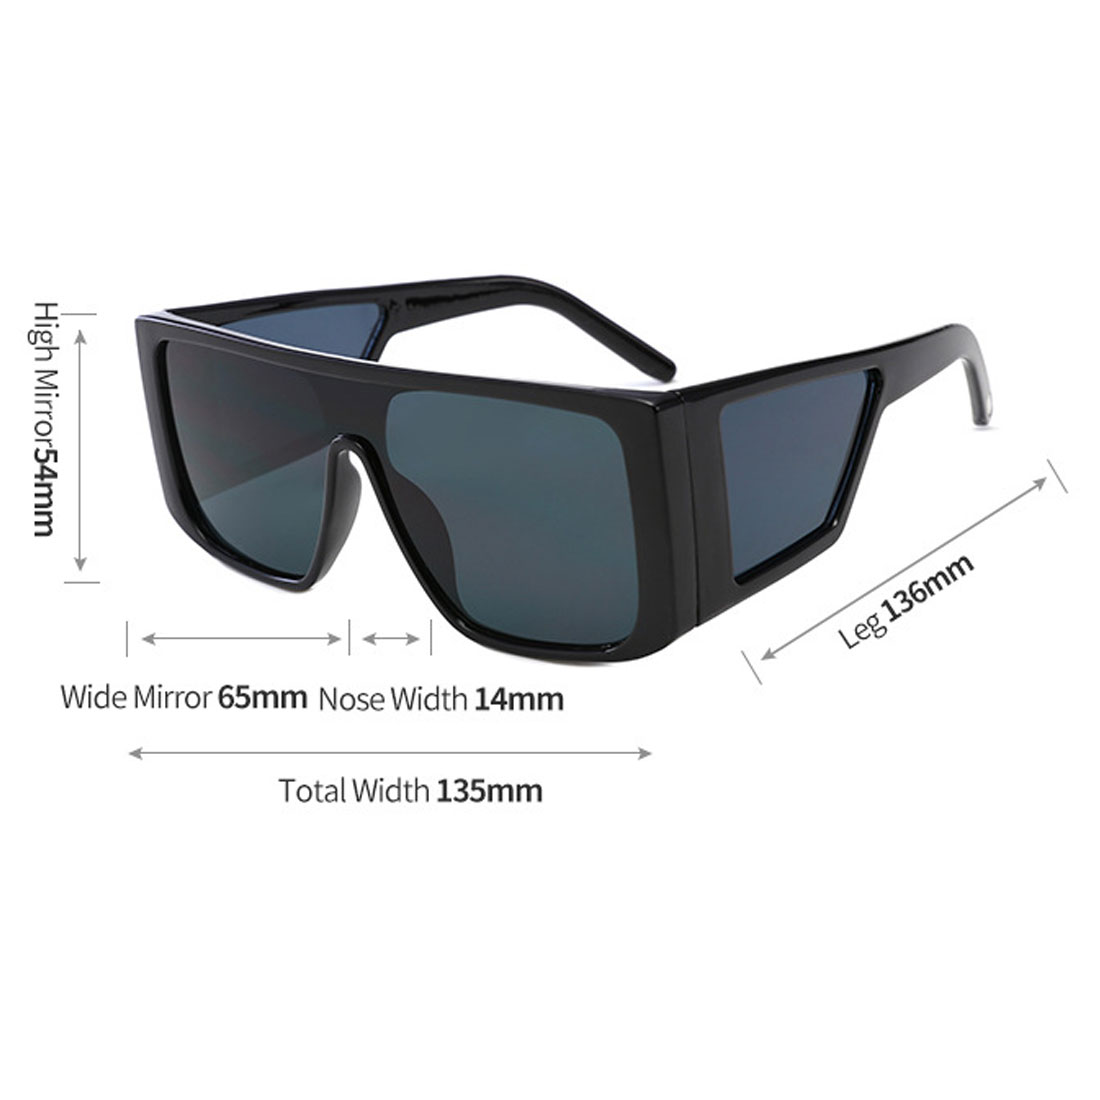 Fashion Unisex Oversize Black Steampunk Sunglasses Driving Cool Sun Glasses Square Male Female Oculos Eyewear in Men 39 s Sunglasses from Apparel Accessories